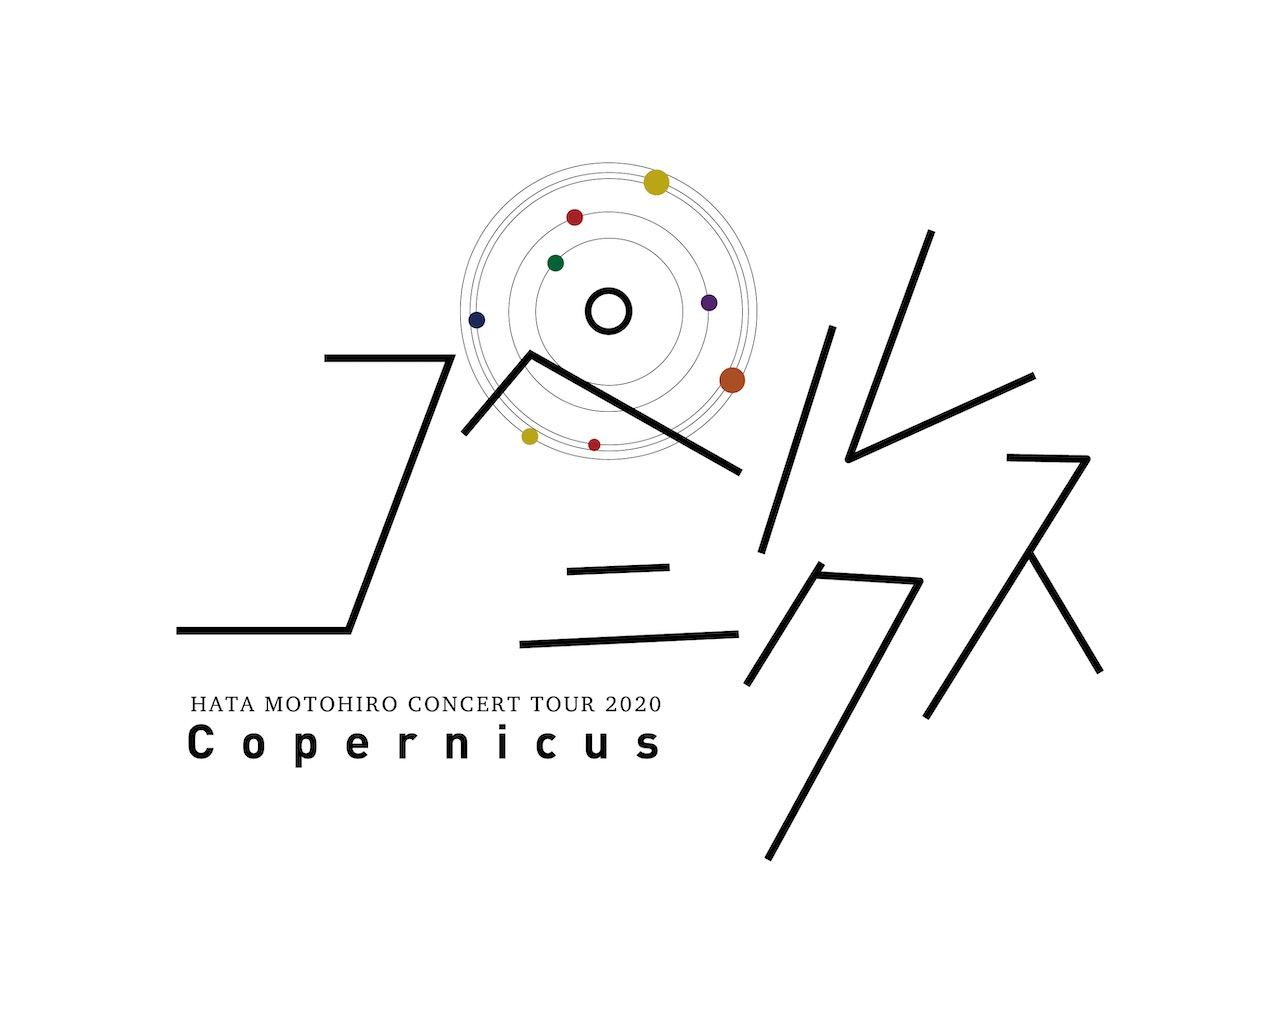 hata_tour_copernicus_logo20201026.jpg